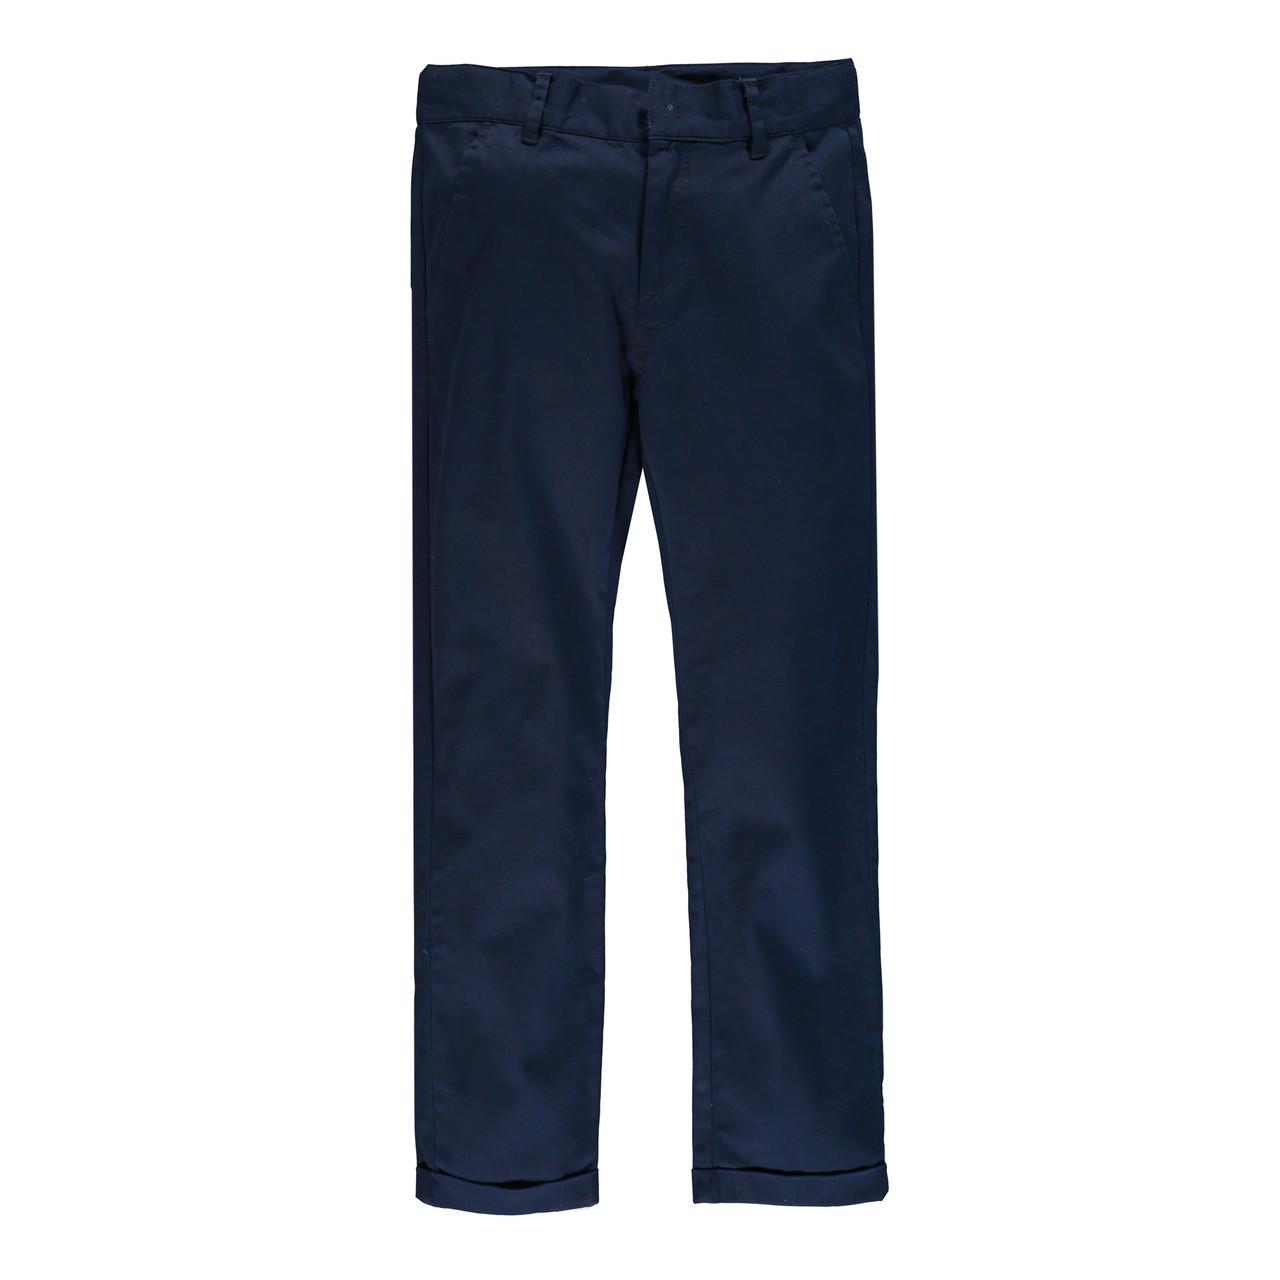 Детские брюки для мальчика MEK Италия 201MHBH001 темно-синий